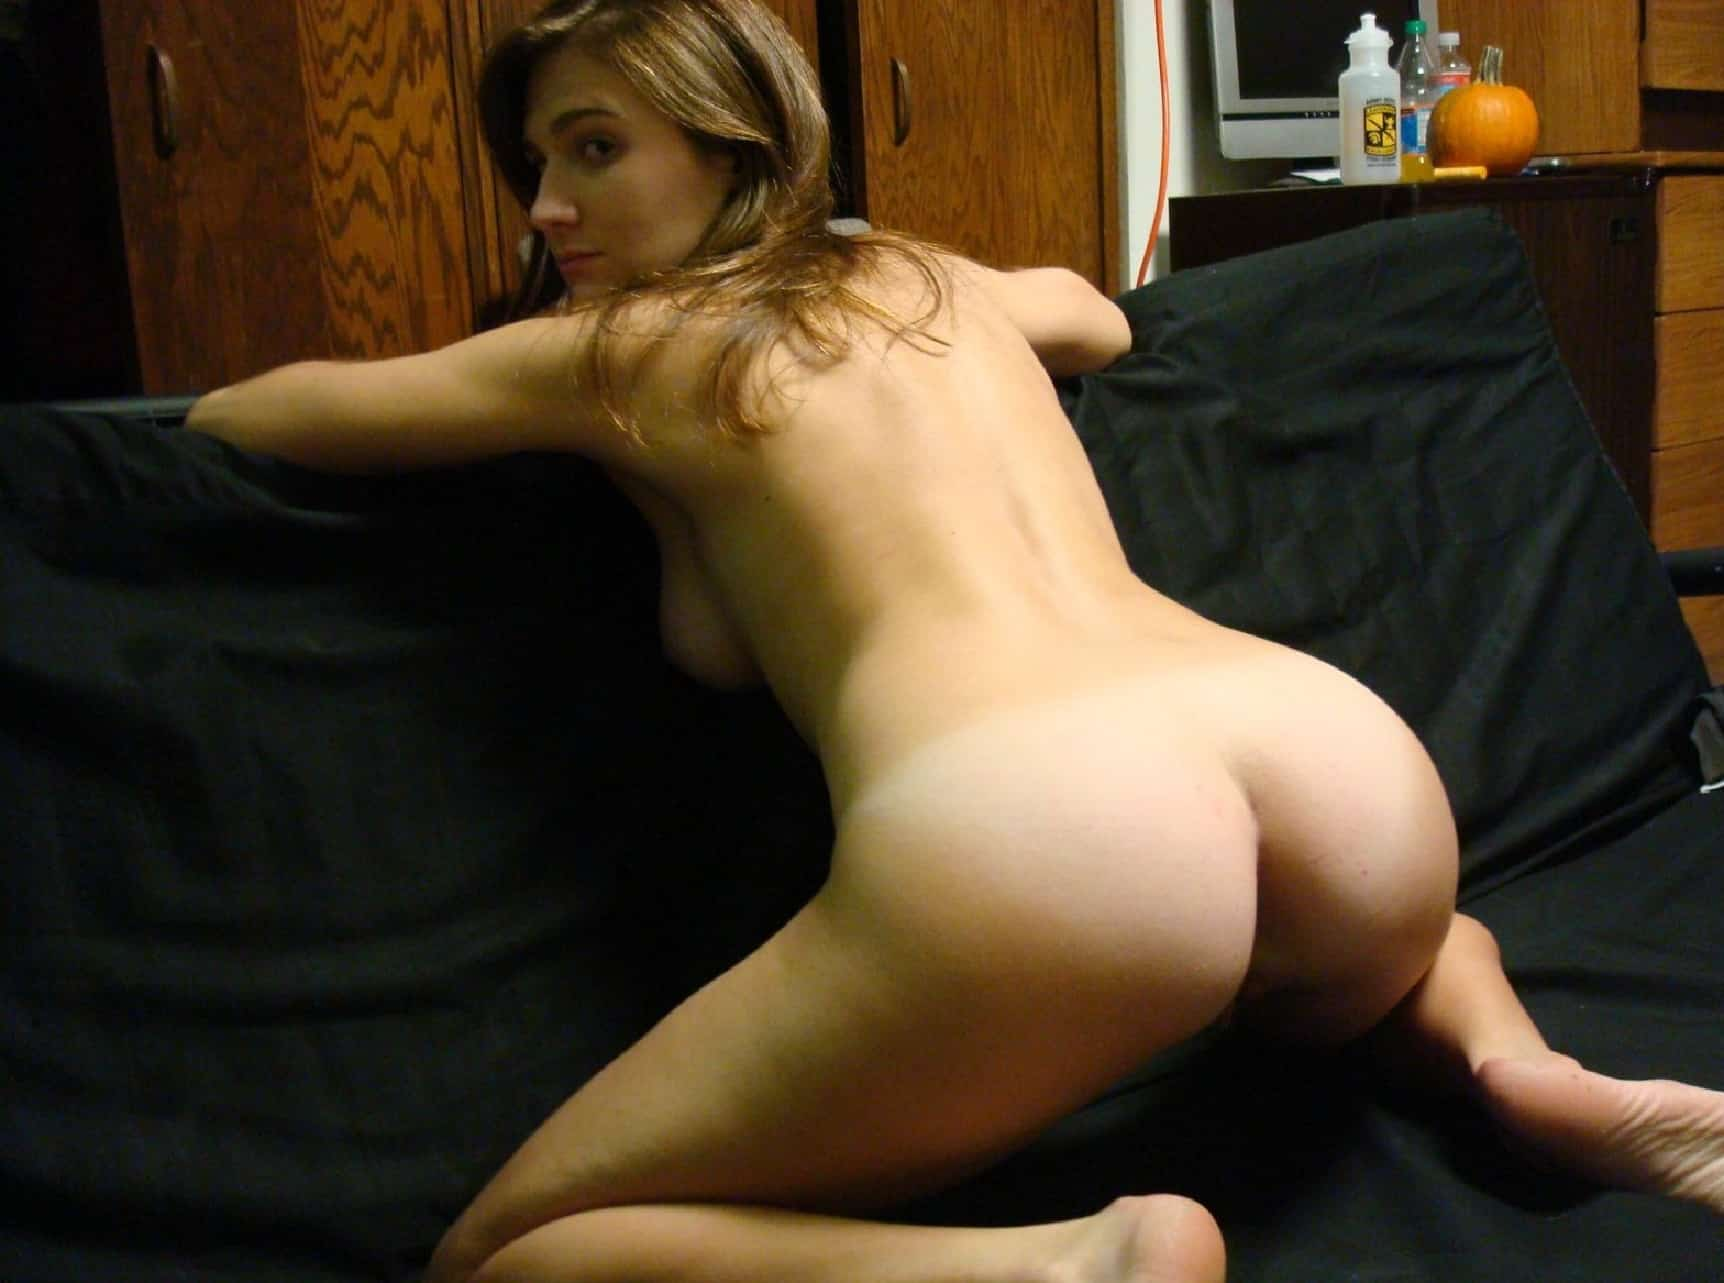 Wife Erotic Nudes